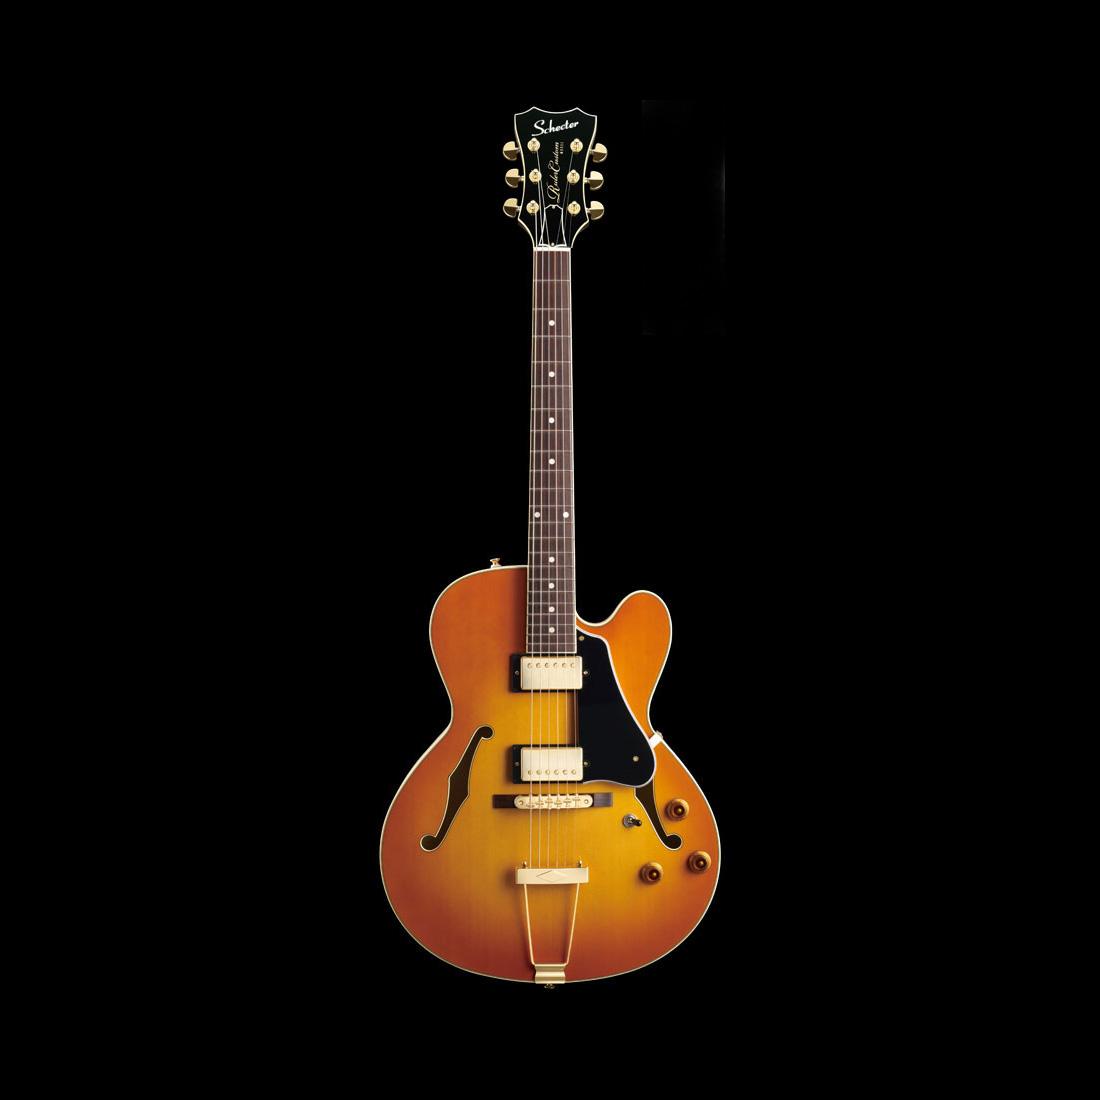 Schecter / R-FS-280 Lemon Drop Sunburst シェクター エレキギター 【お取り寄せ商品】